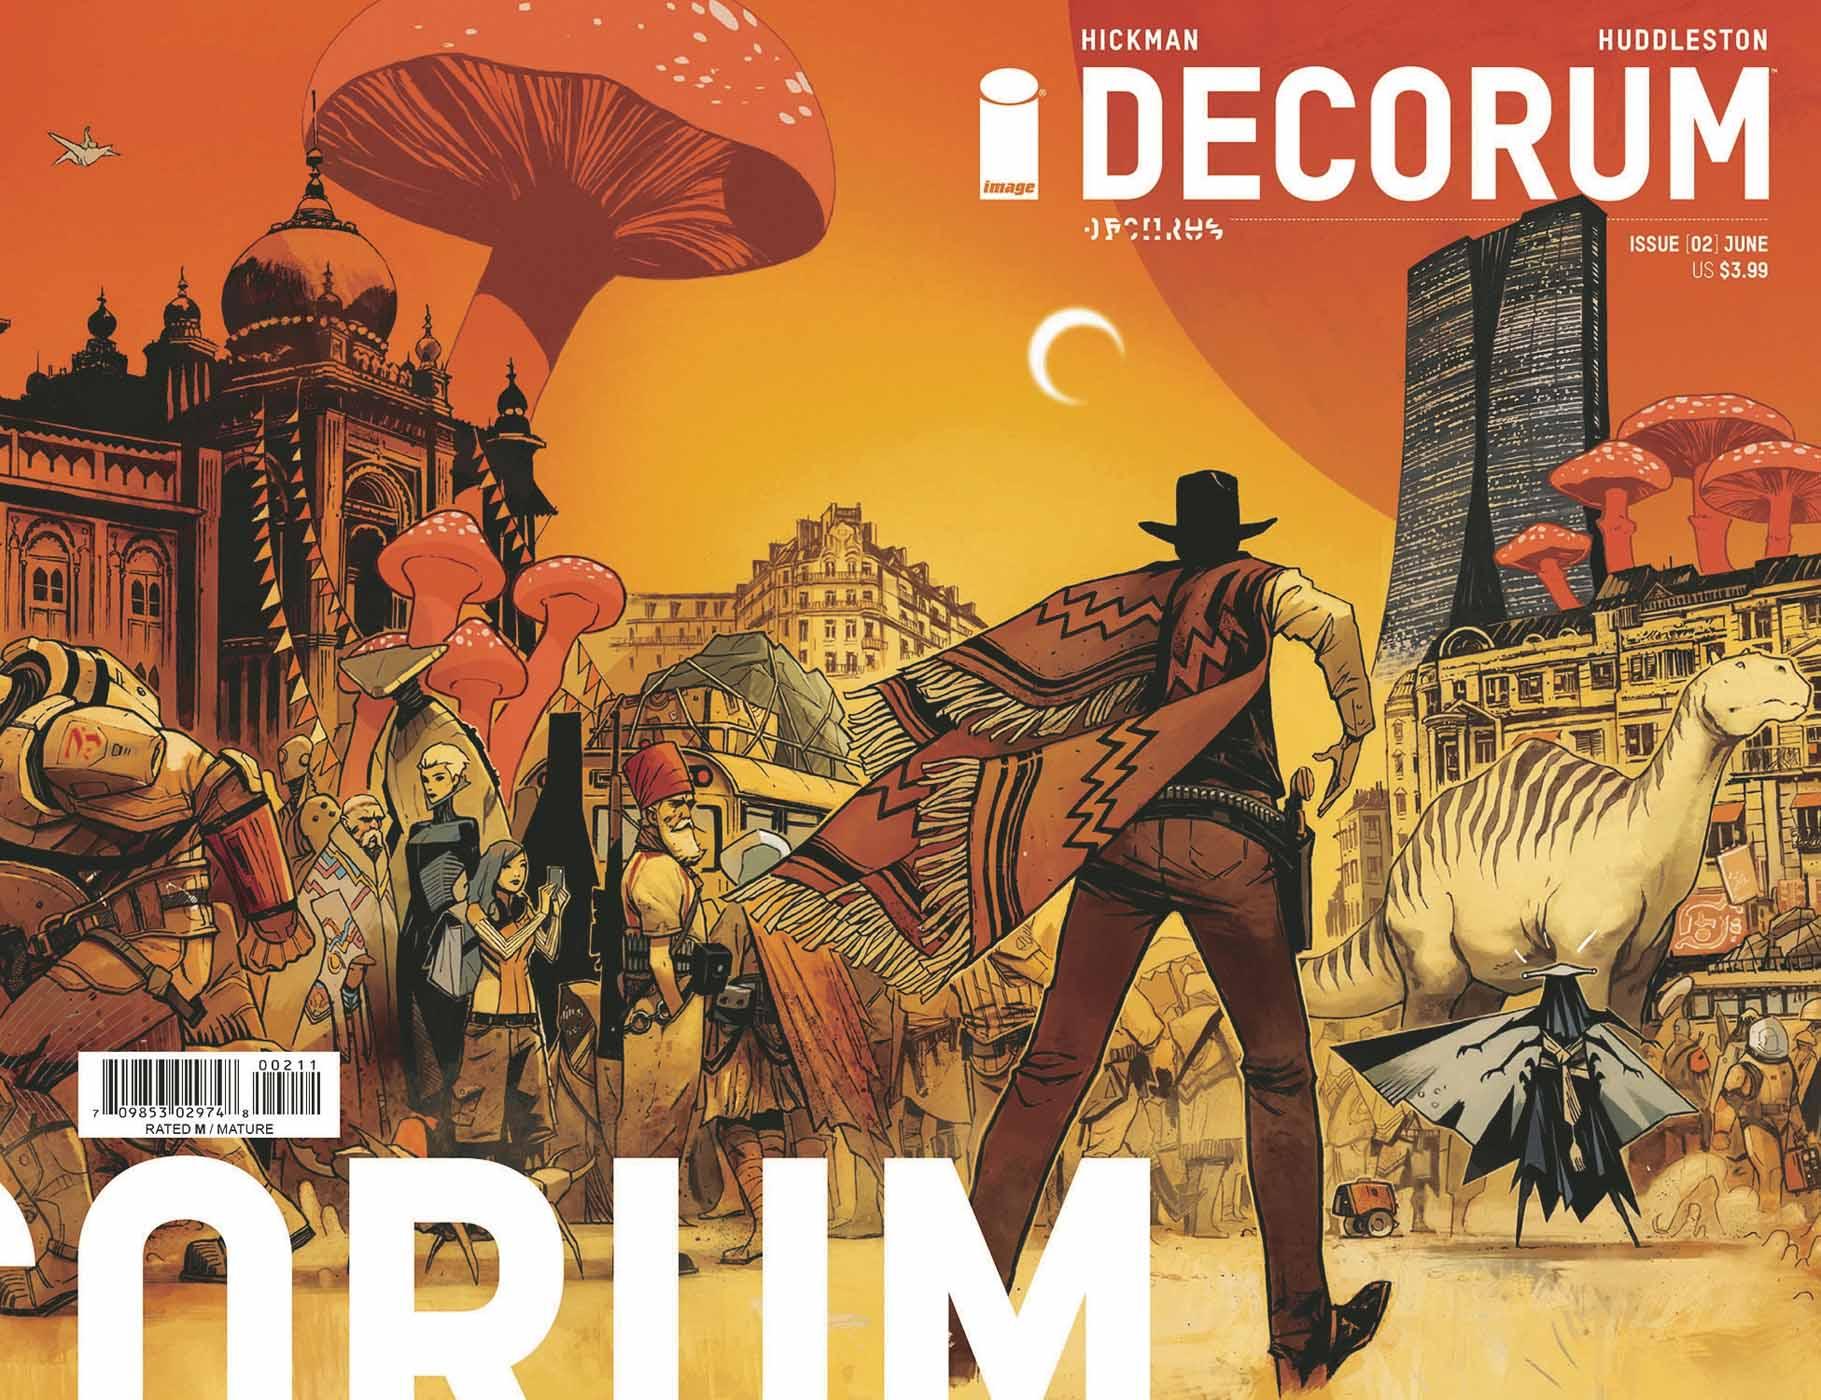 decorum2a